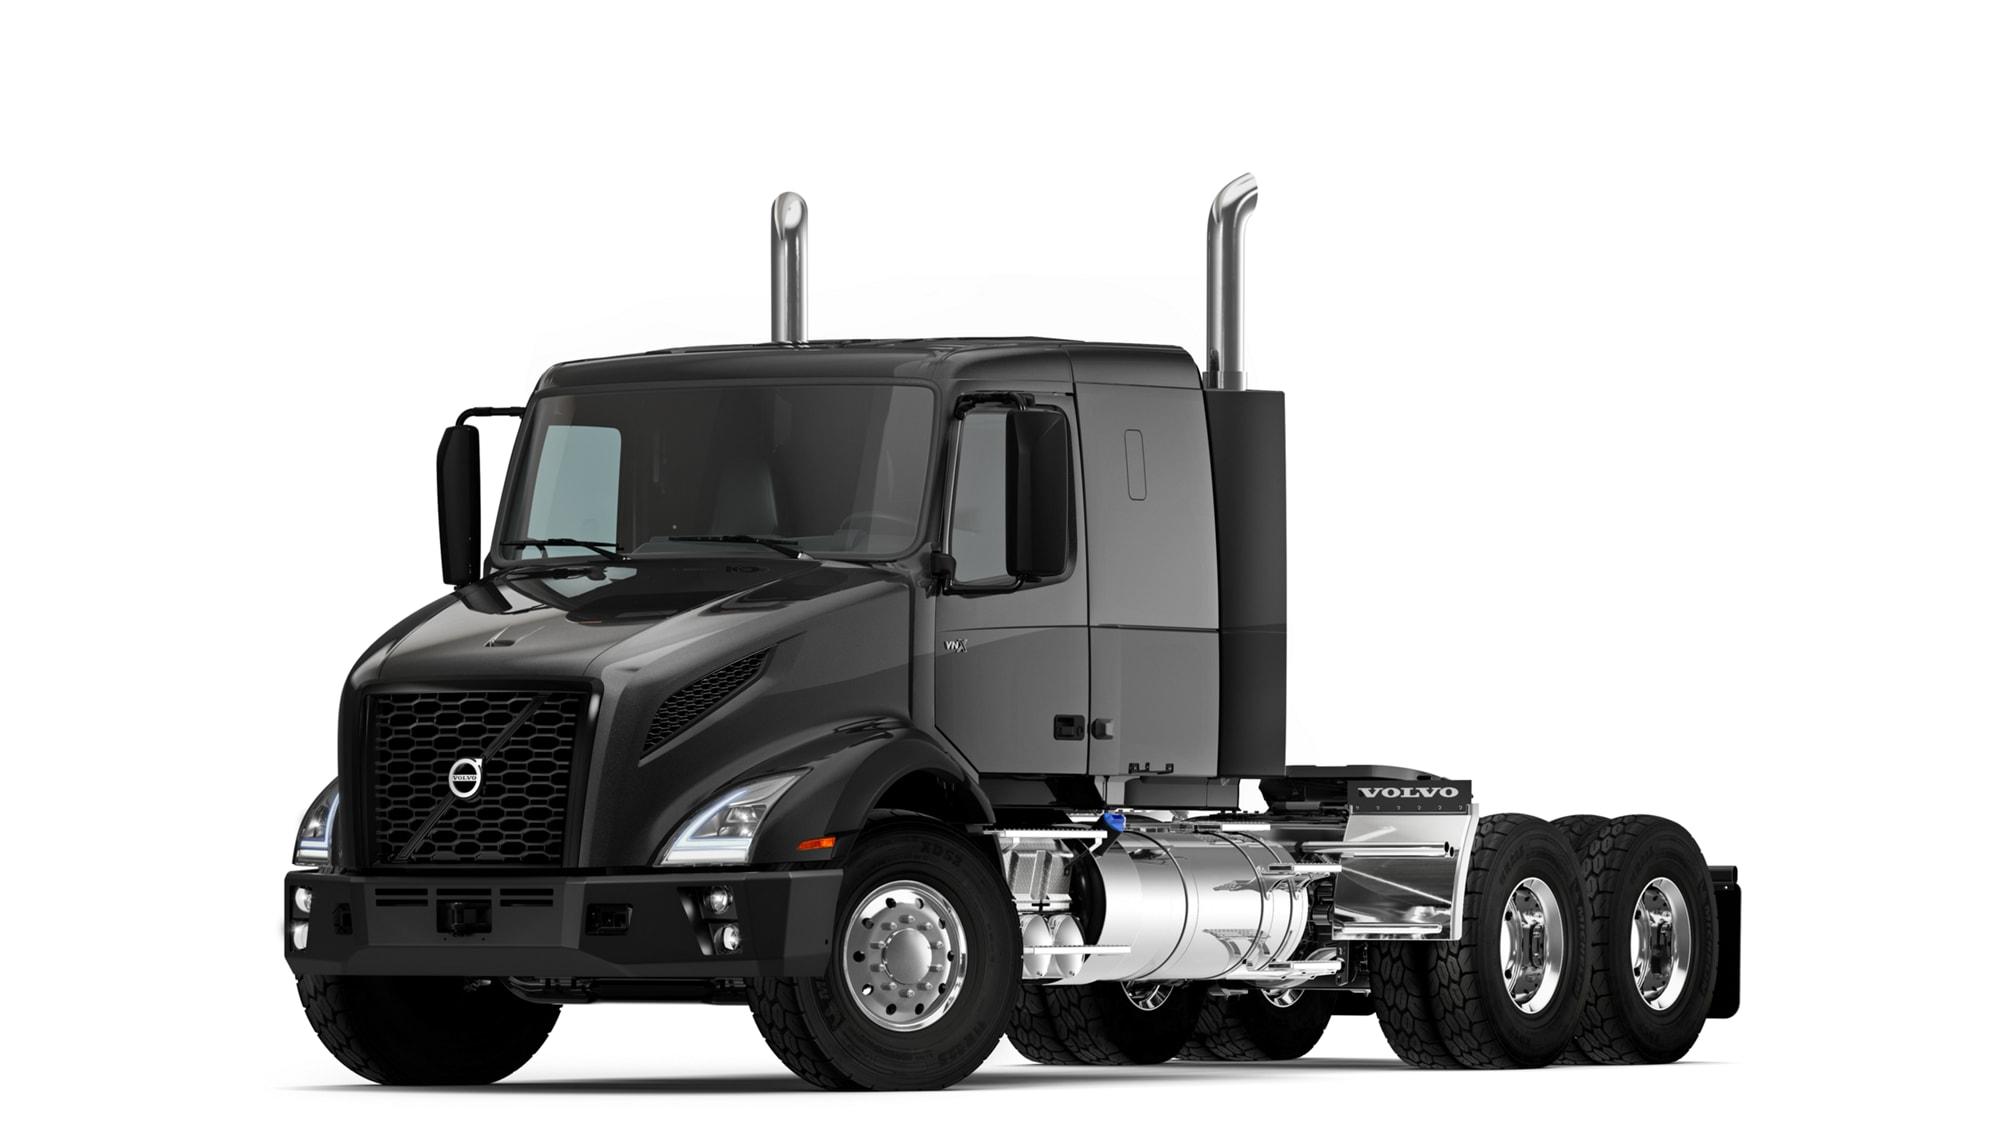 Volvo Truck Dealer >> Volvo trucks in Peterborough & Ajax ON | Volvo VNM, VNL ...